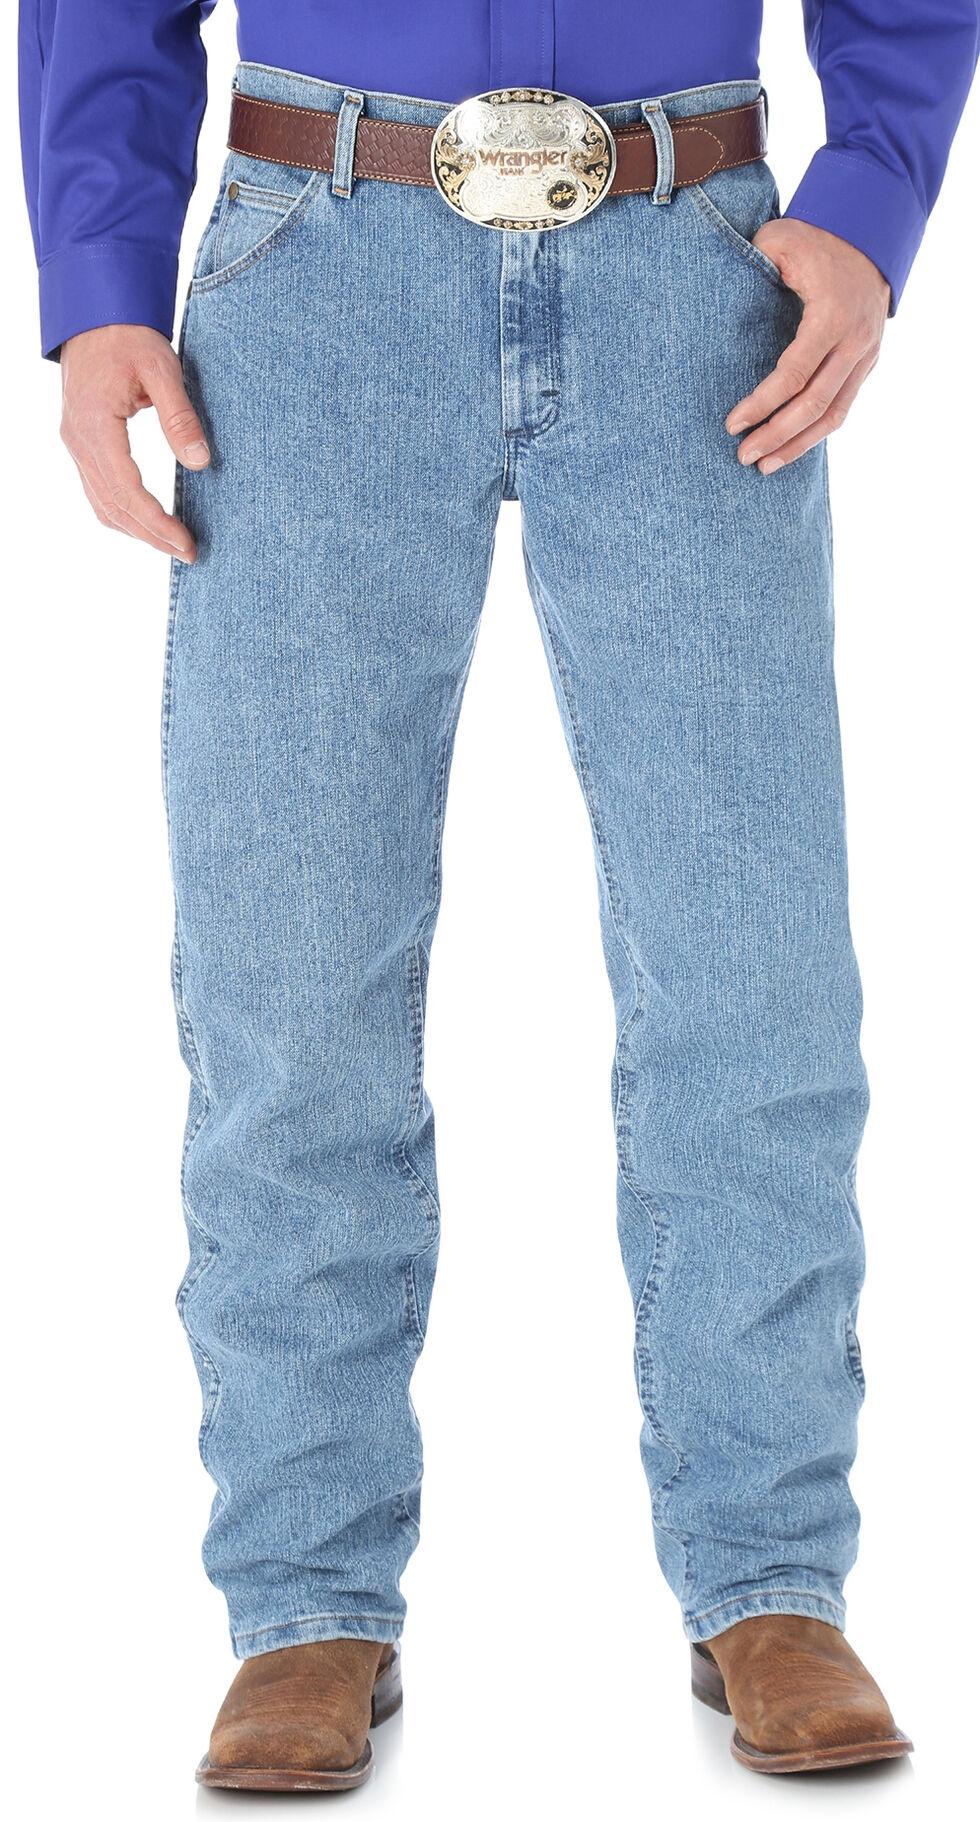 Wrangler Men's Premium Performance Cool Vantage Cowboy Cut Regular Fit Jeans, Light Stone, hi-res